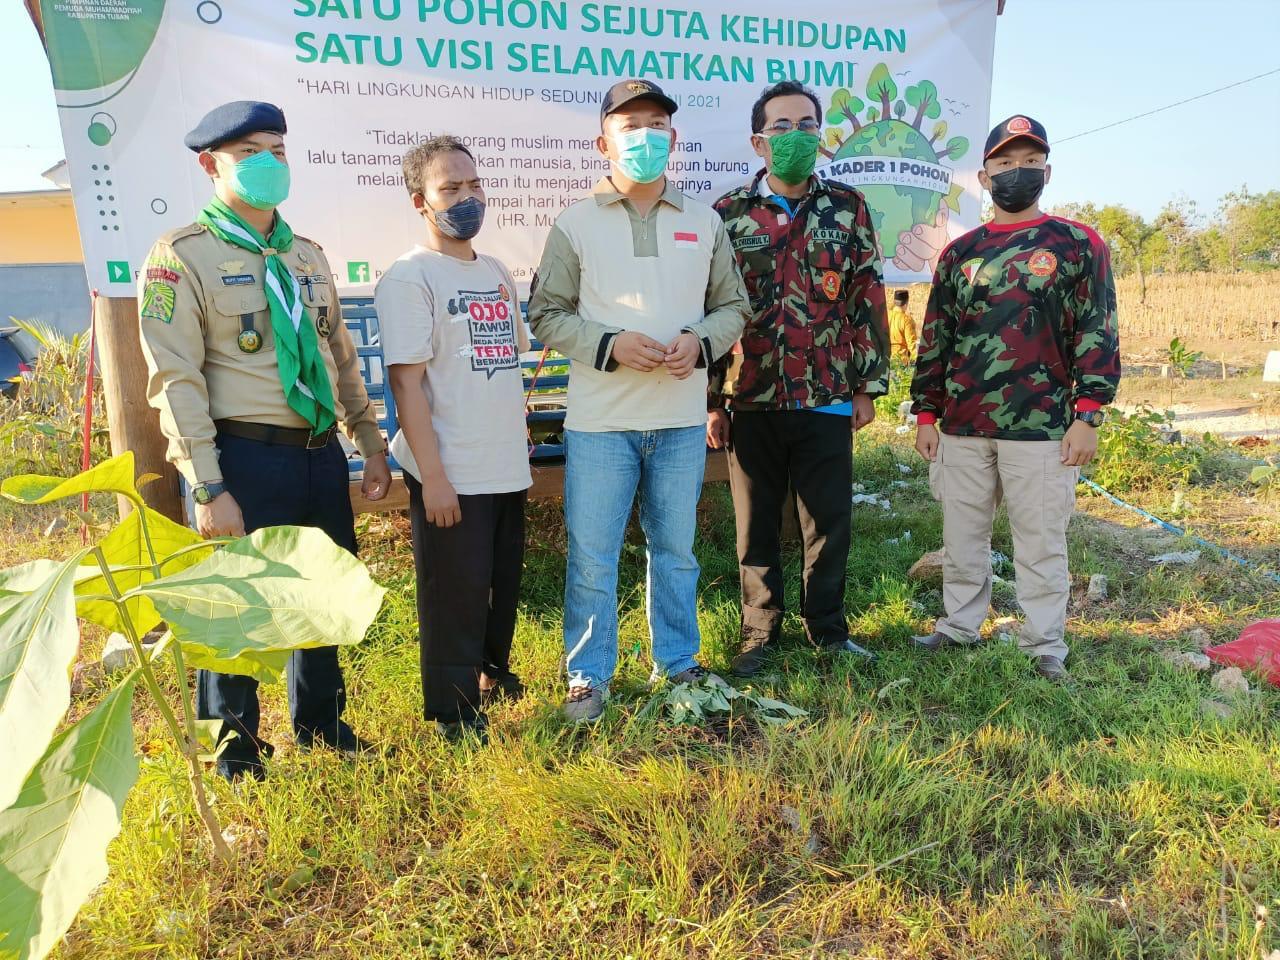 Gerakan Tanam Satu Juta Pohon, Pemuda Muhammadiyah Jatim Ajak Masyarakat Jaga Kelestarian Lingkungan